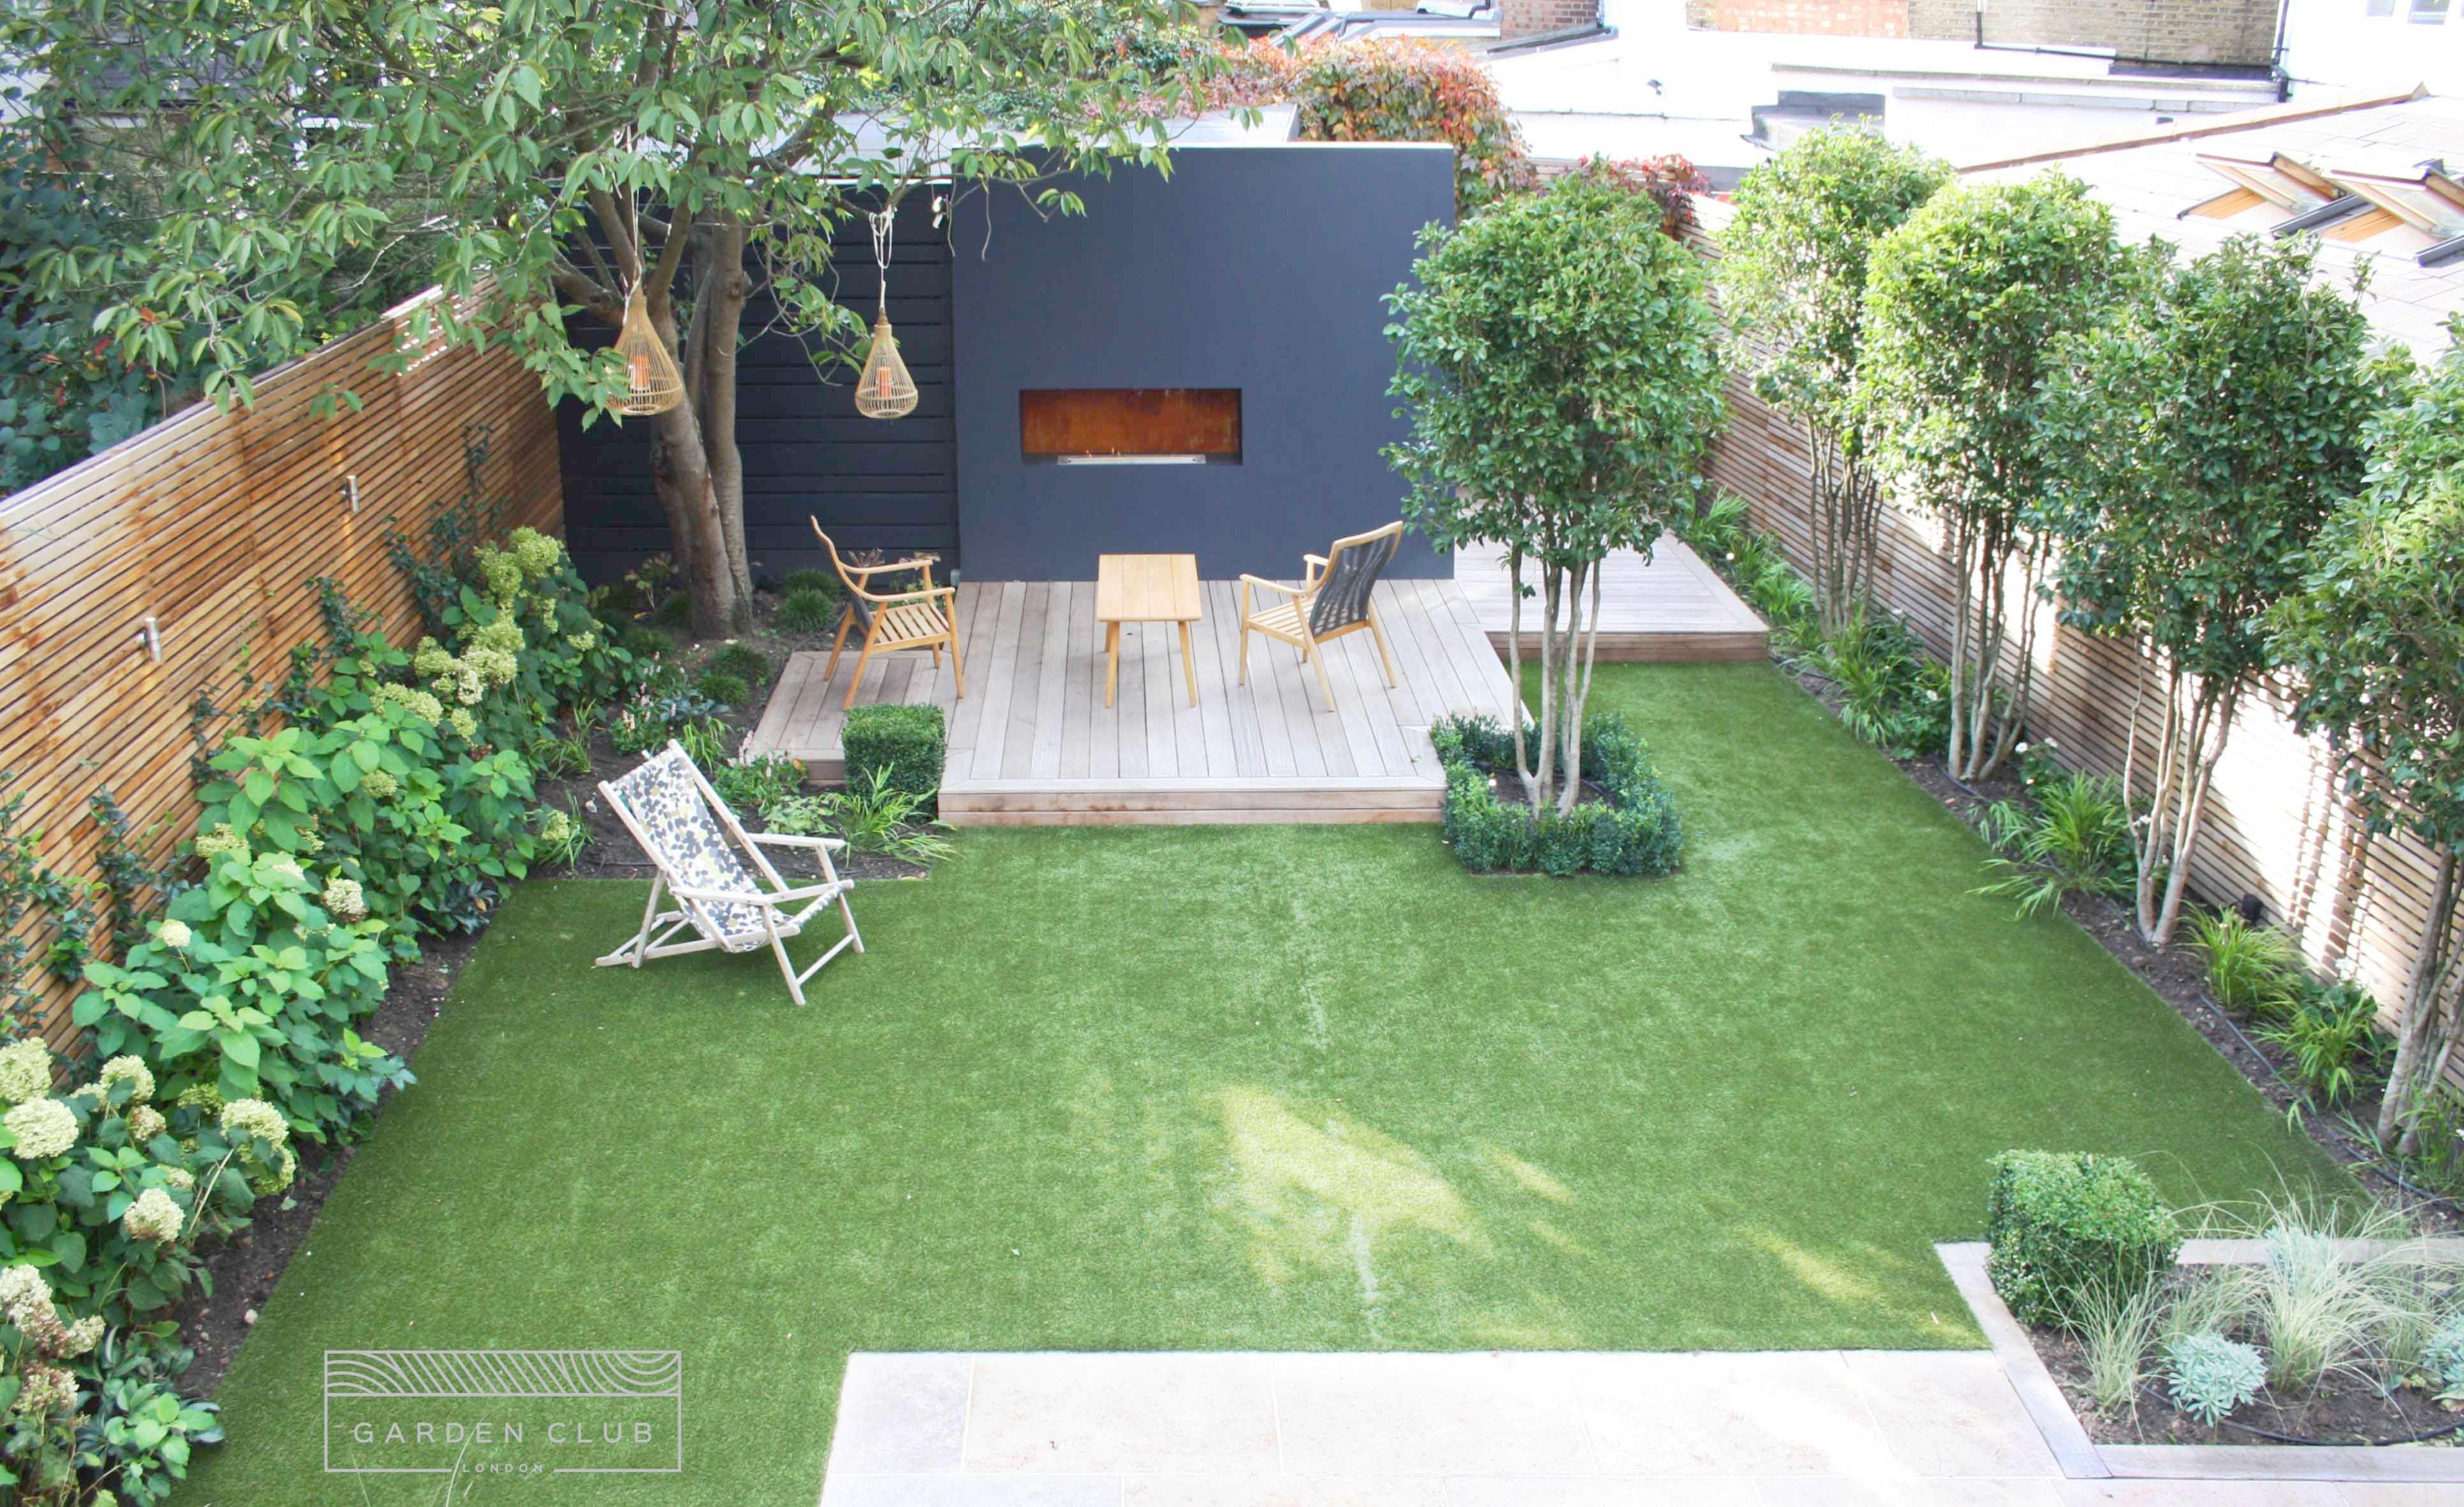 Landscape Gardening Courses Milton Keynes During Landscape Gardening Pay Monthly Urban Garden Design Modern Garden London Garden